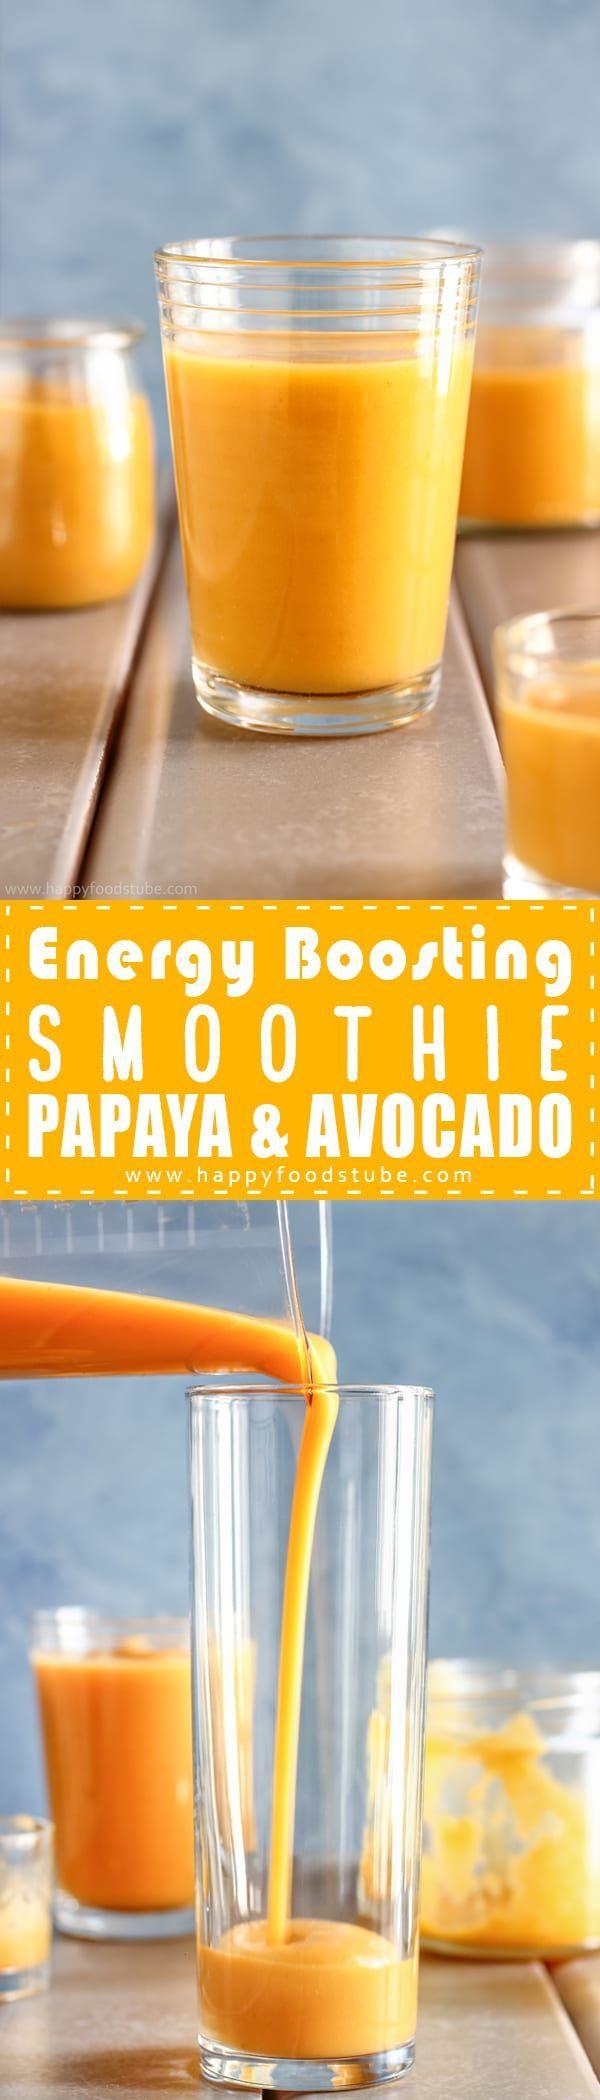 Energy boosting smoothie recipe with papaya & avocado. Healthy energy boosting smoothie. Best weight loss smoothie recipe. Energy smoothy for workout via /happyfoodstube/